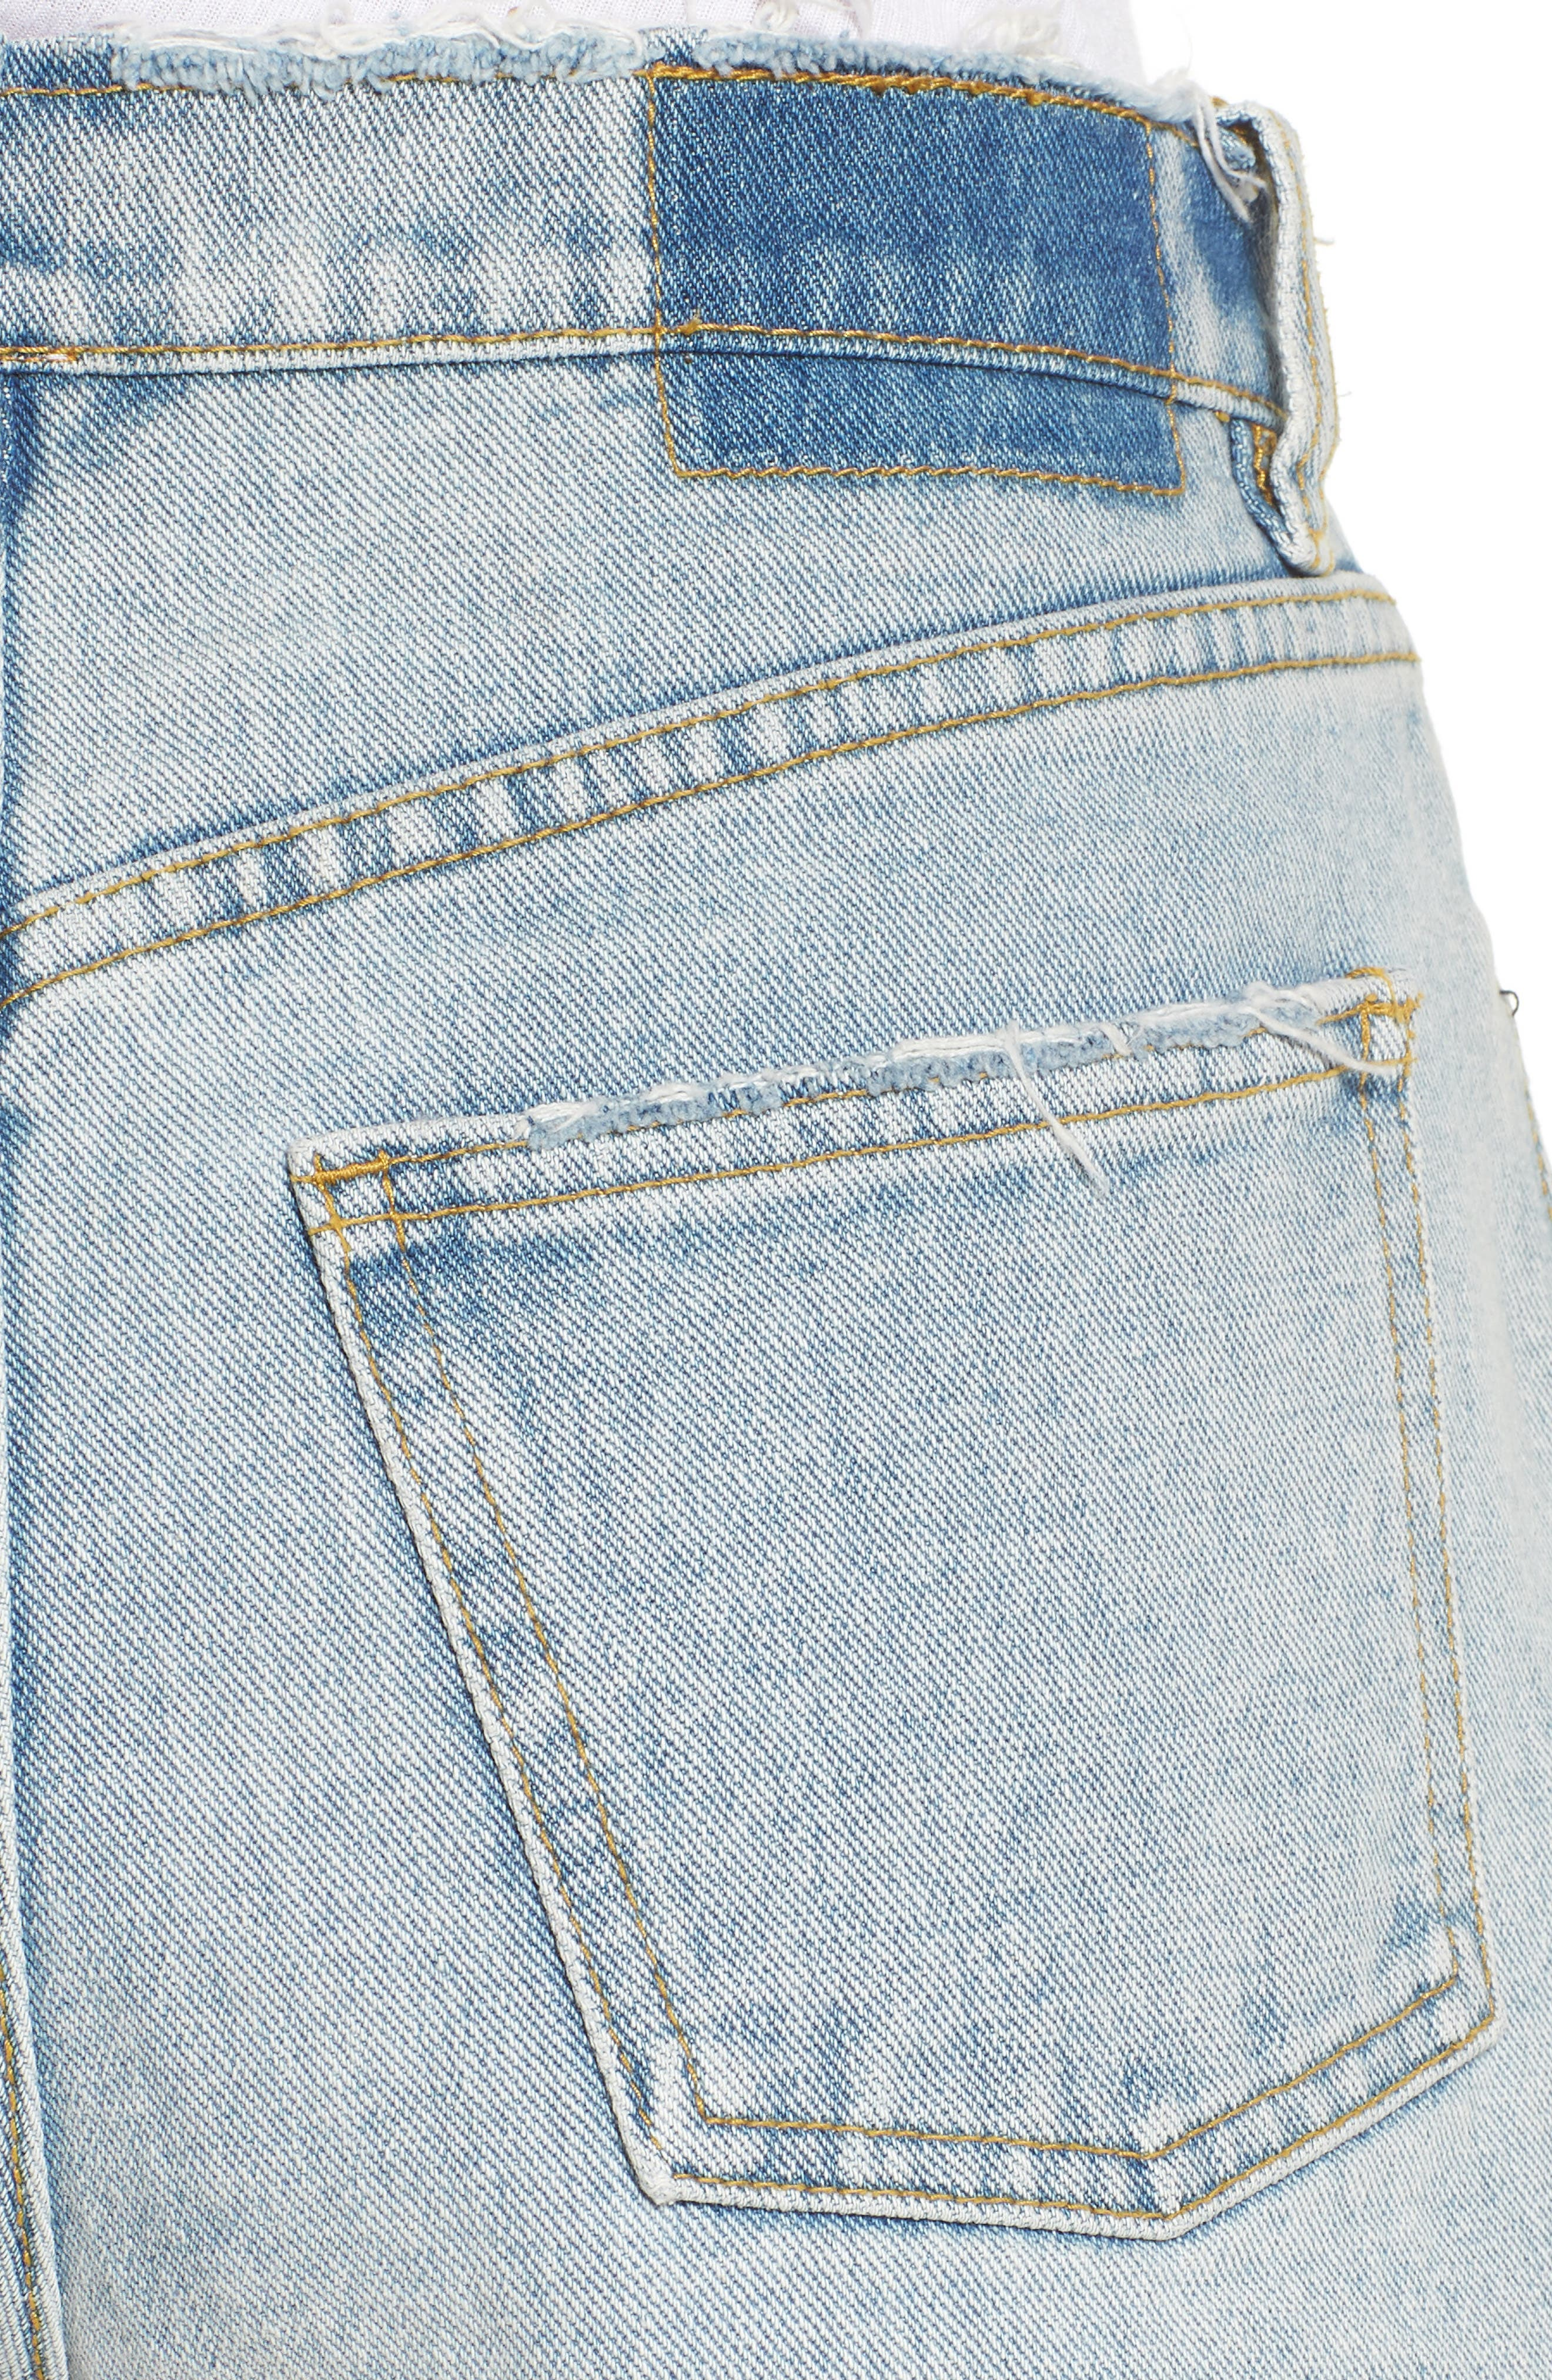 Denim Shorts,                             Alternate thumbnail 4, color,                             Sea Wash